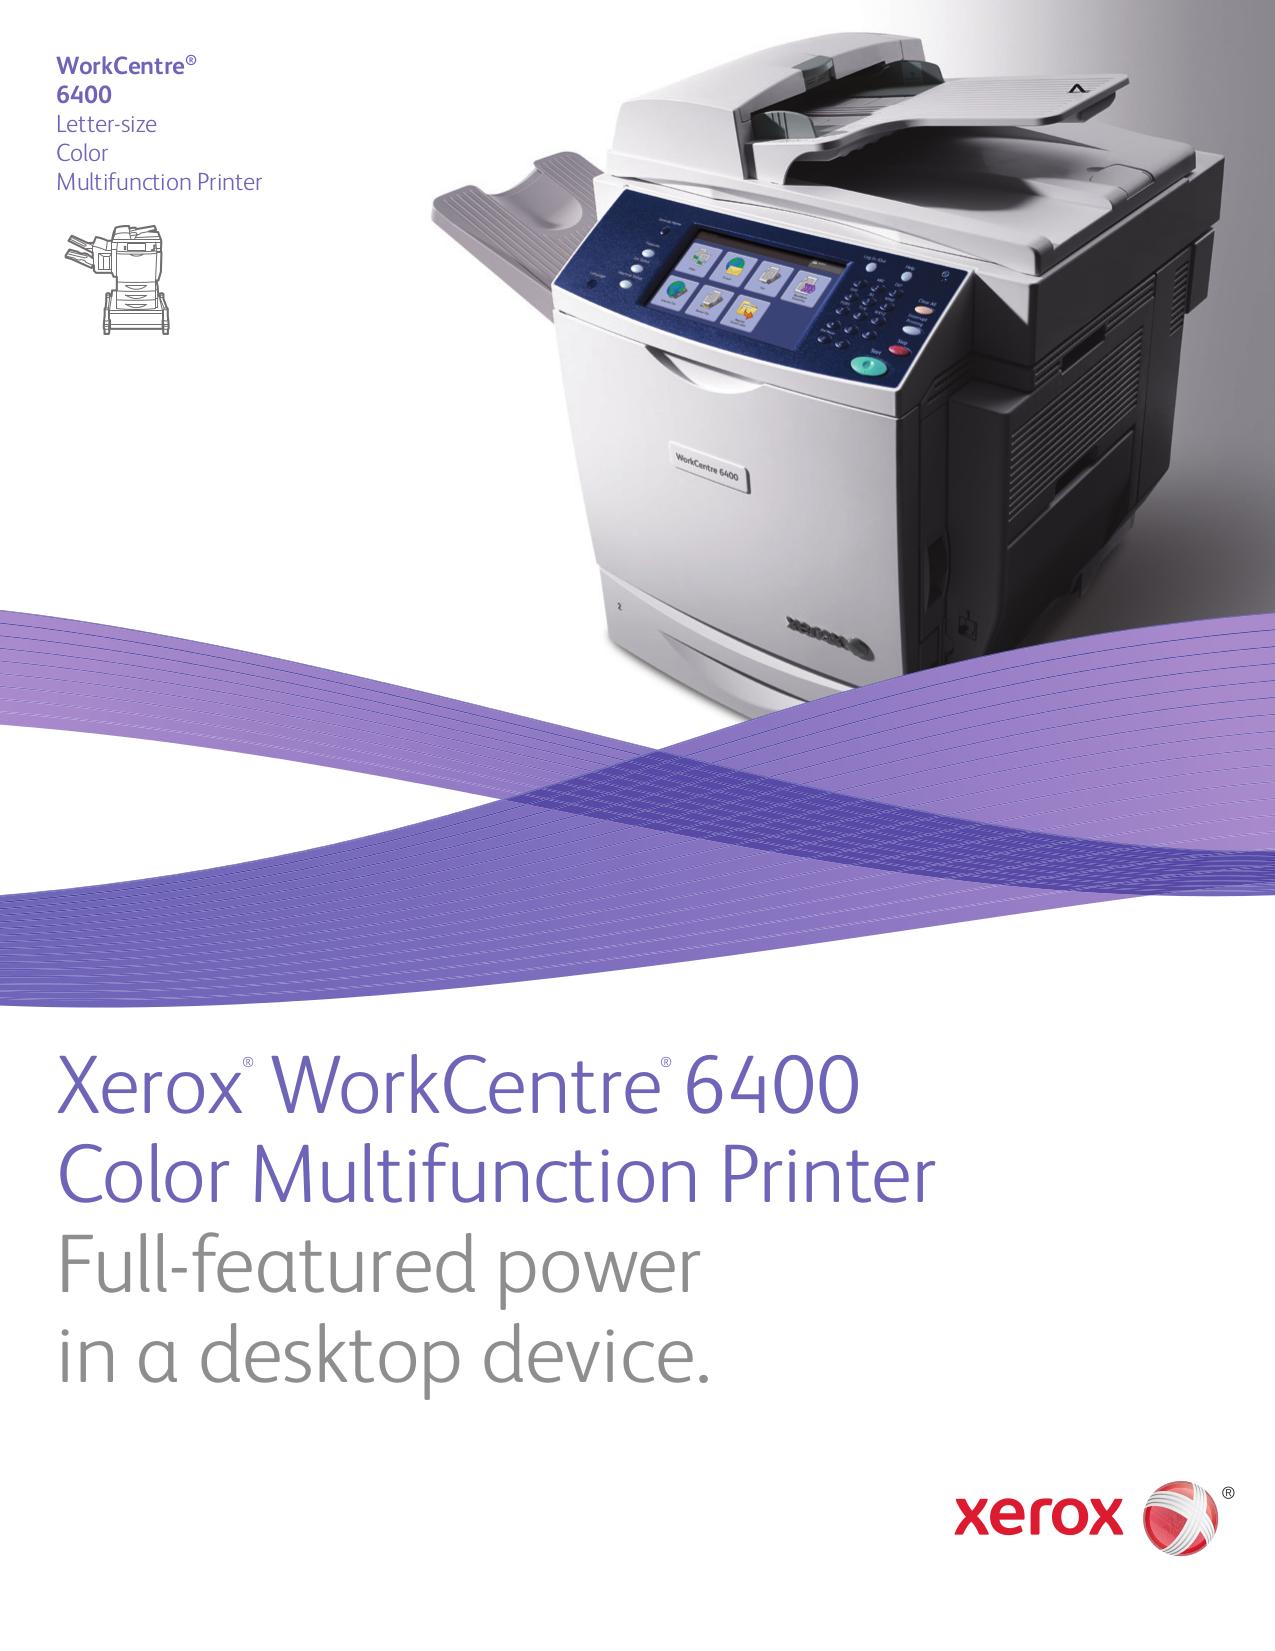 xerox workcentre 5050 service manual ebook rh xerox workcentre 5050 service manual ebook an